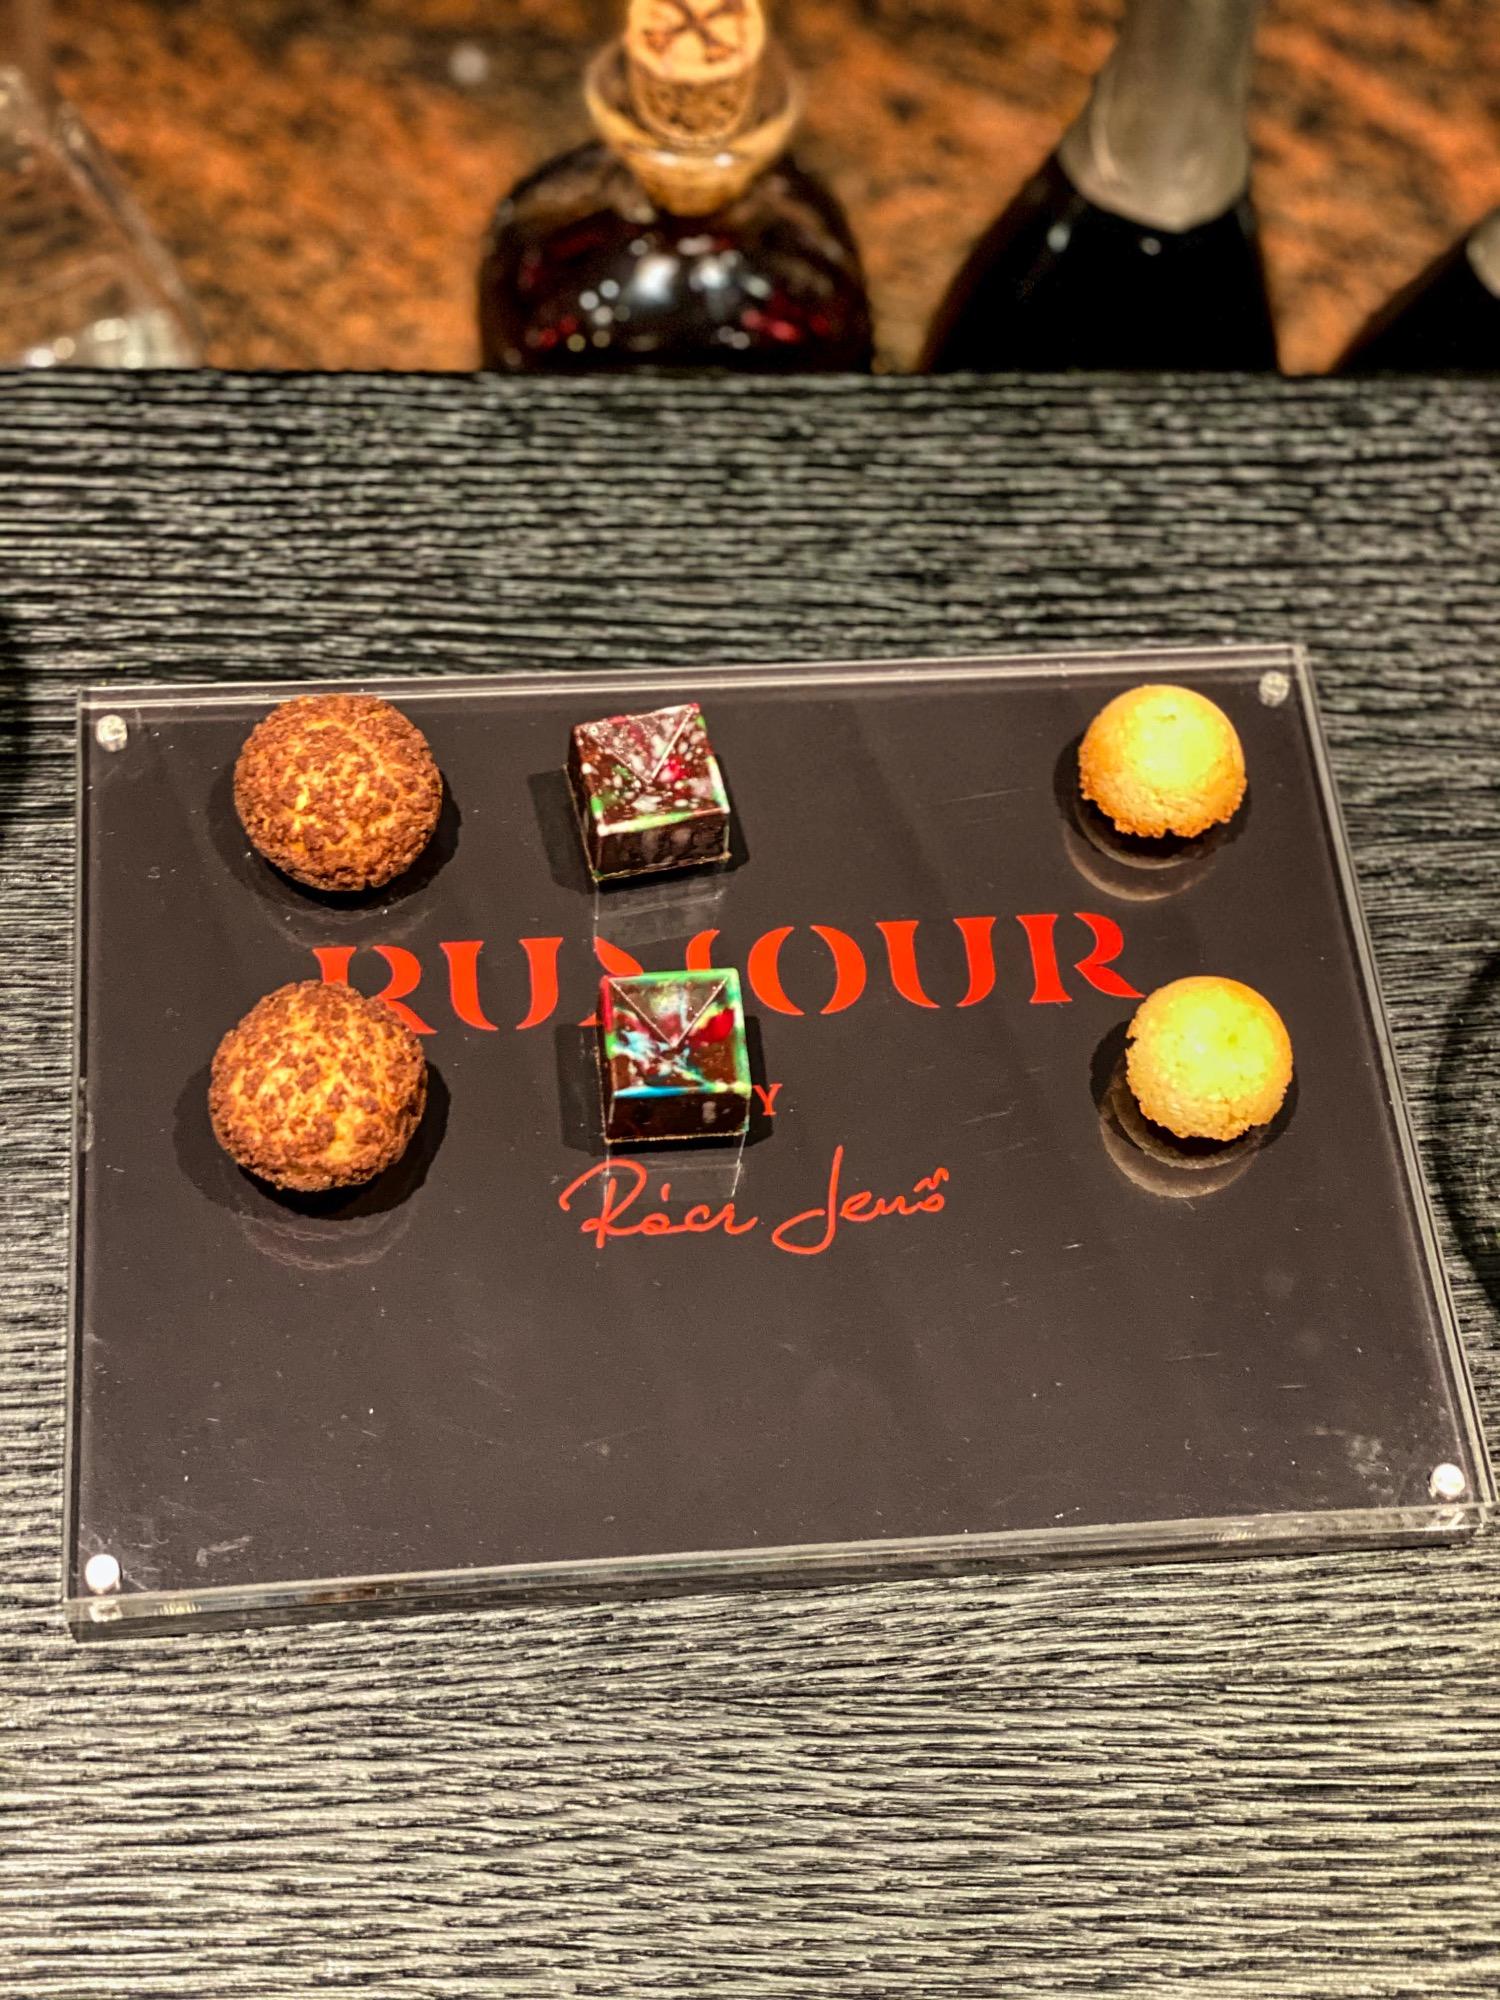 img_8670_rumour_racz_jeno_budapest_restaurant_jokuti_vilagevo_l_f.jpeg